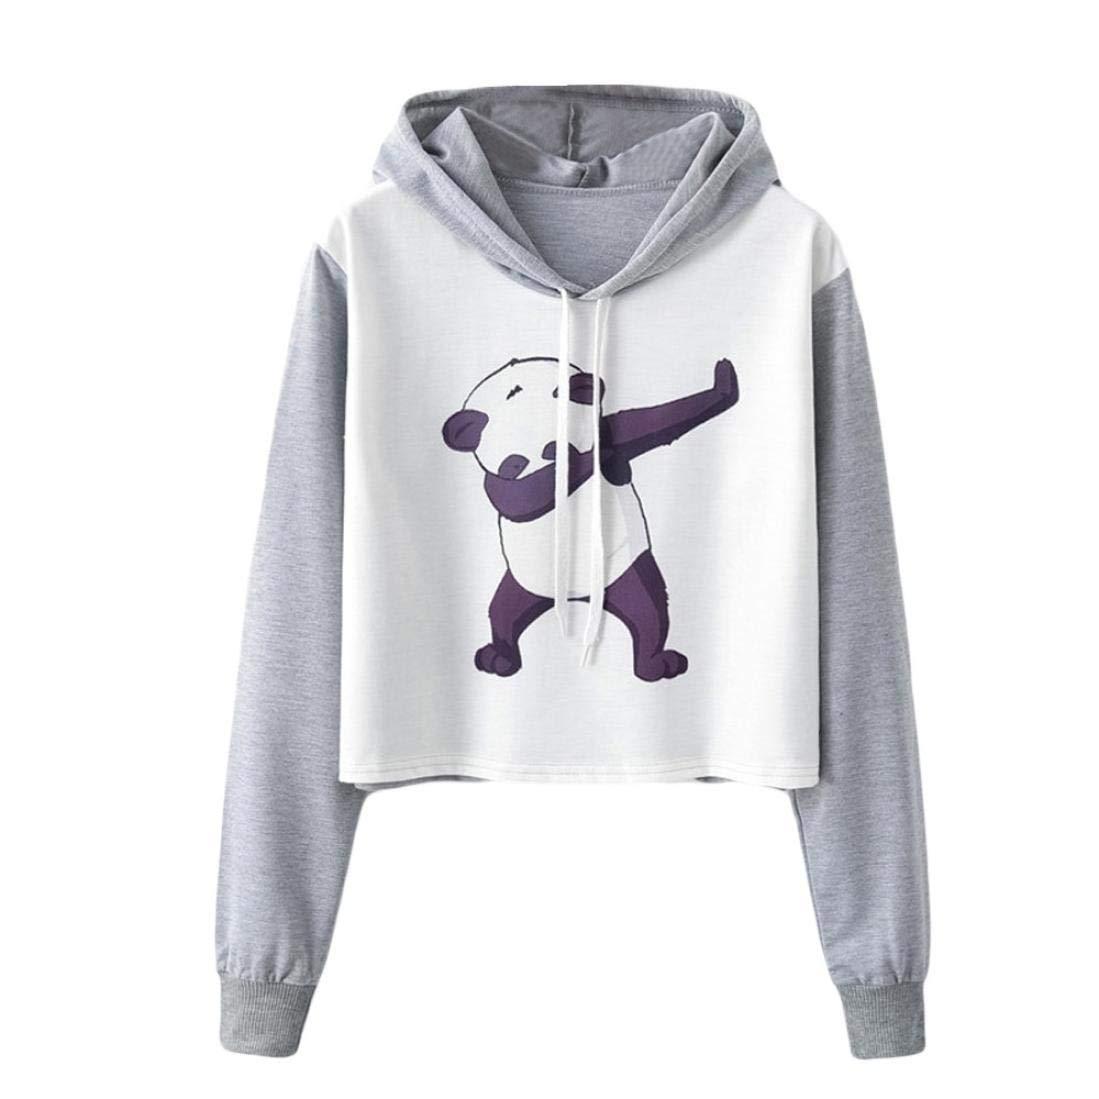 Happy-Day Women Autumn Hoodies T-Shirts & Tops Long Sleeve Panda Printed Loose Fit Hooded Sweatshirt